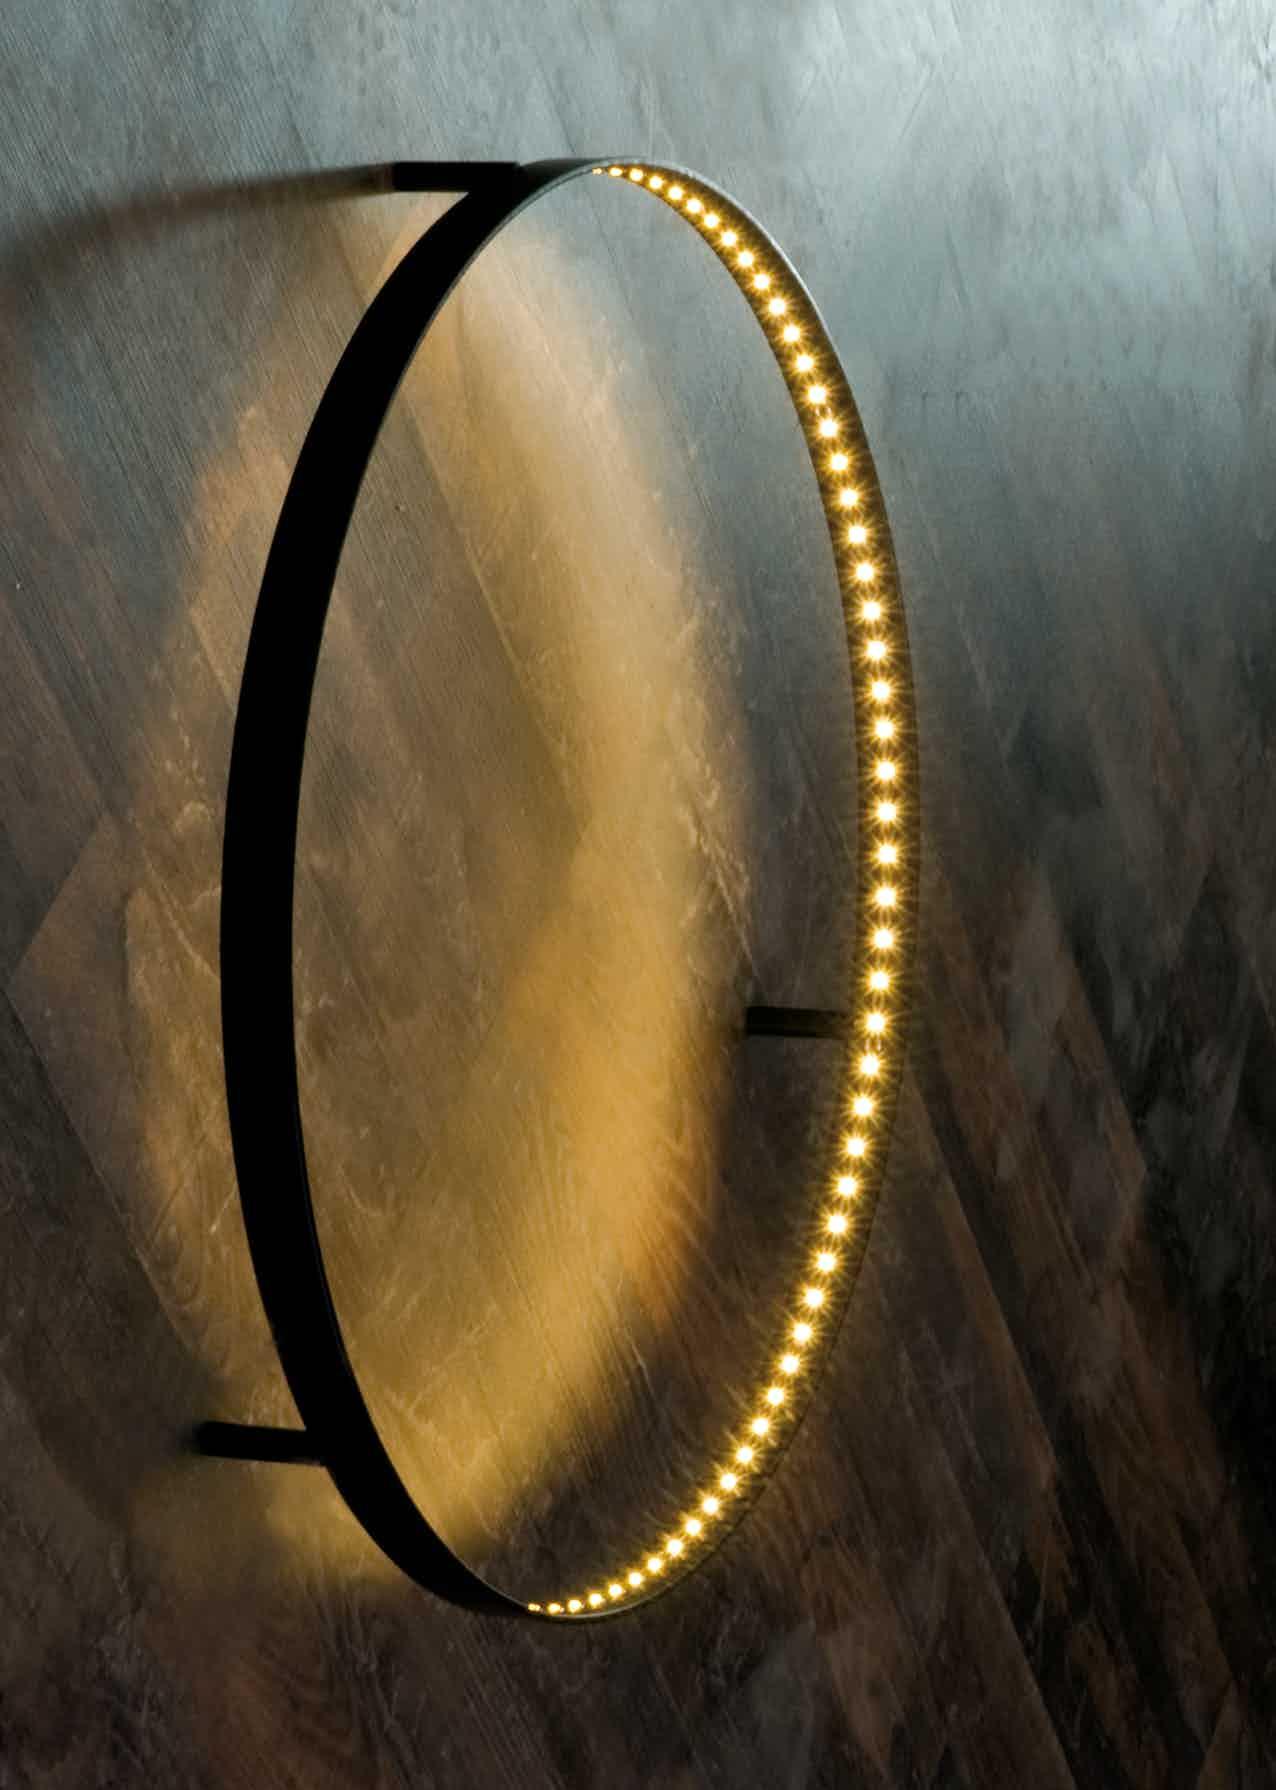 Le-deun-luminaires-curve-wall-lamp-hardwood-haute-living